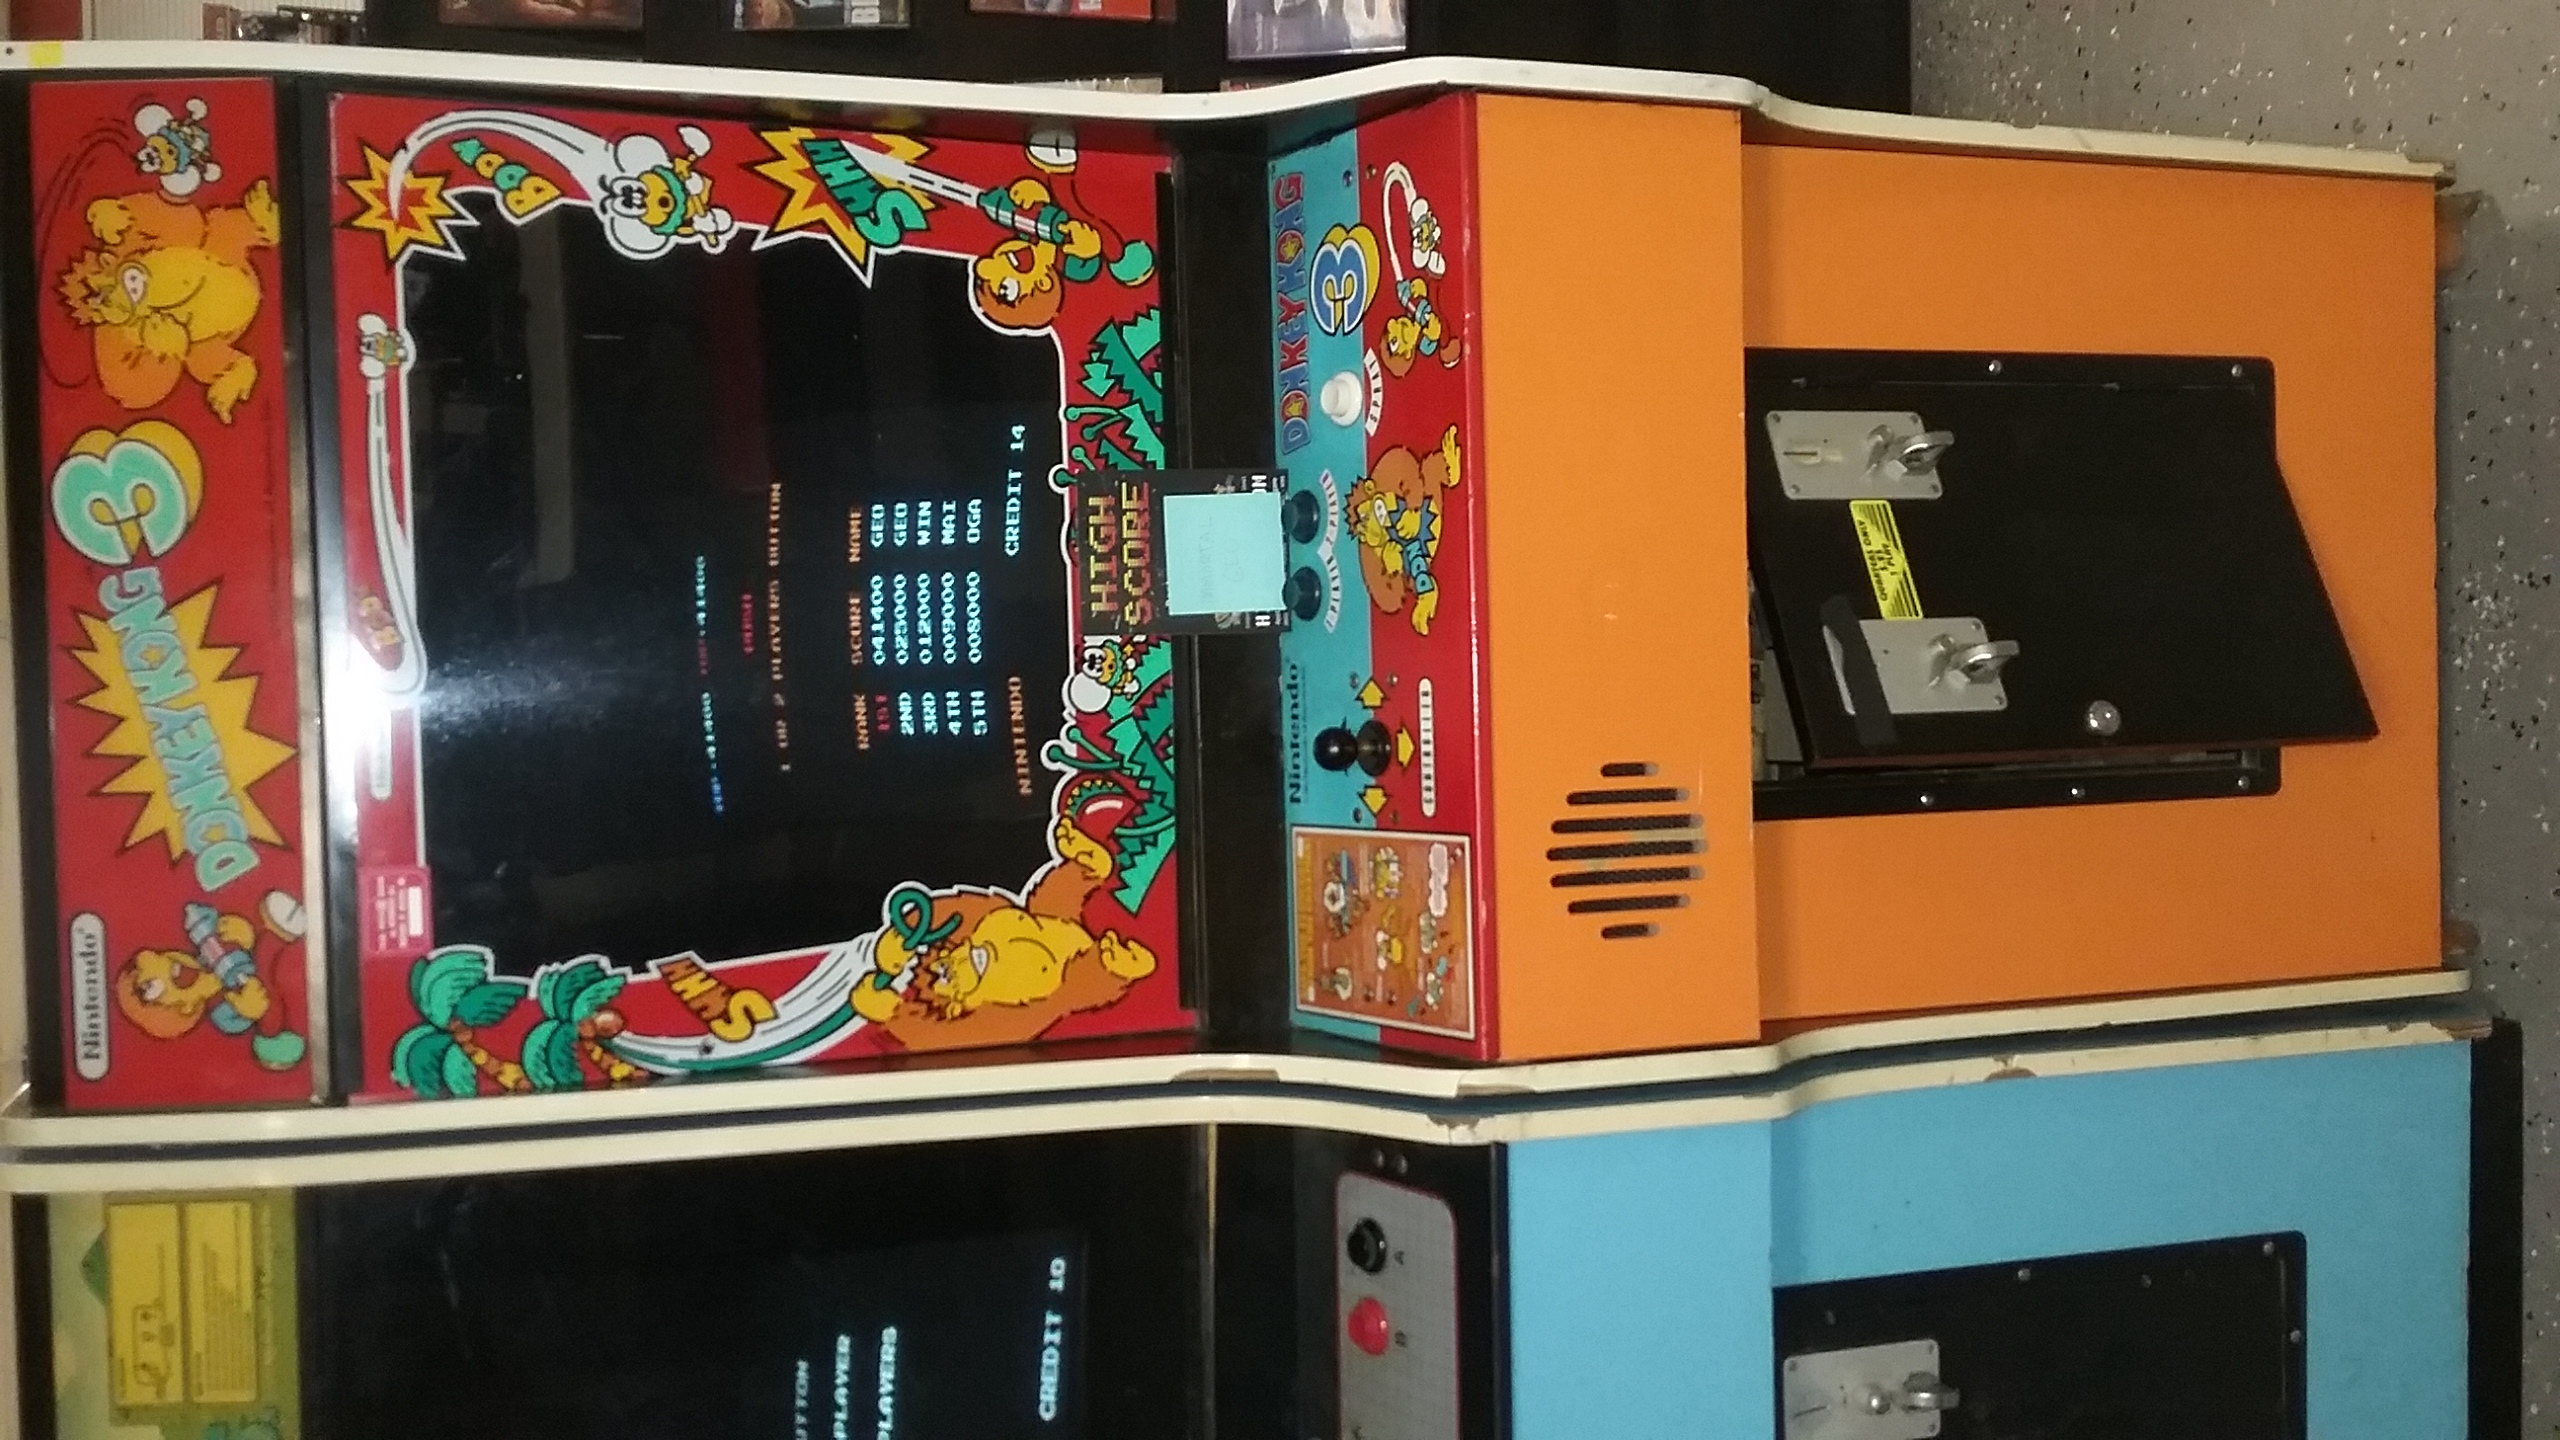 Immortalgeo: Donkey Kong 3 (Arcade) 41,400 points on 2016-12-05 16:39:54